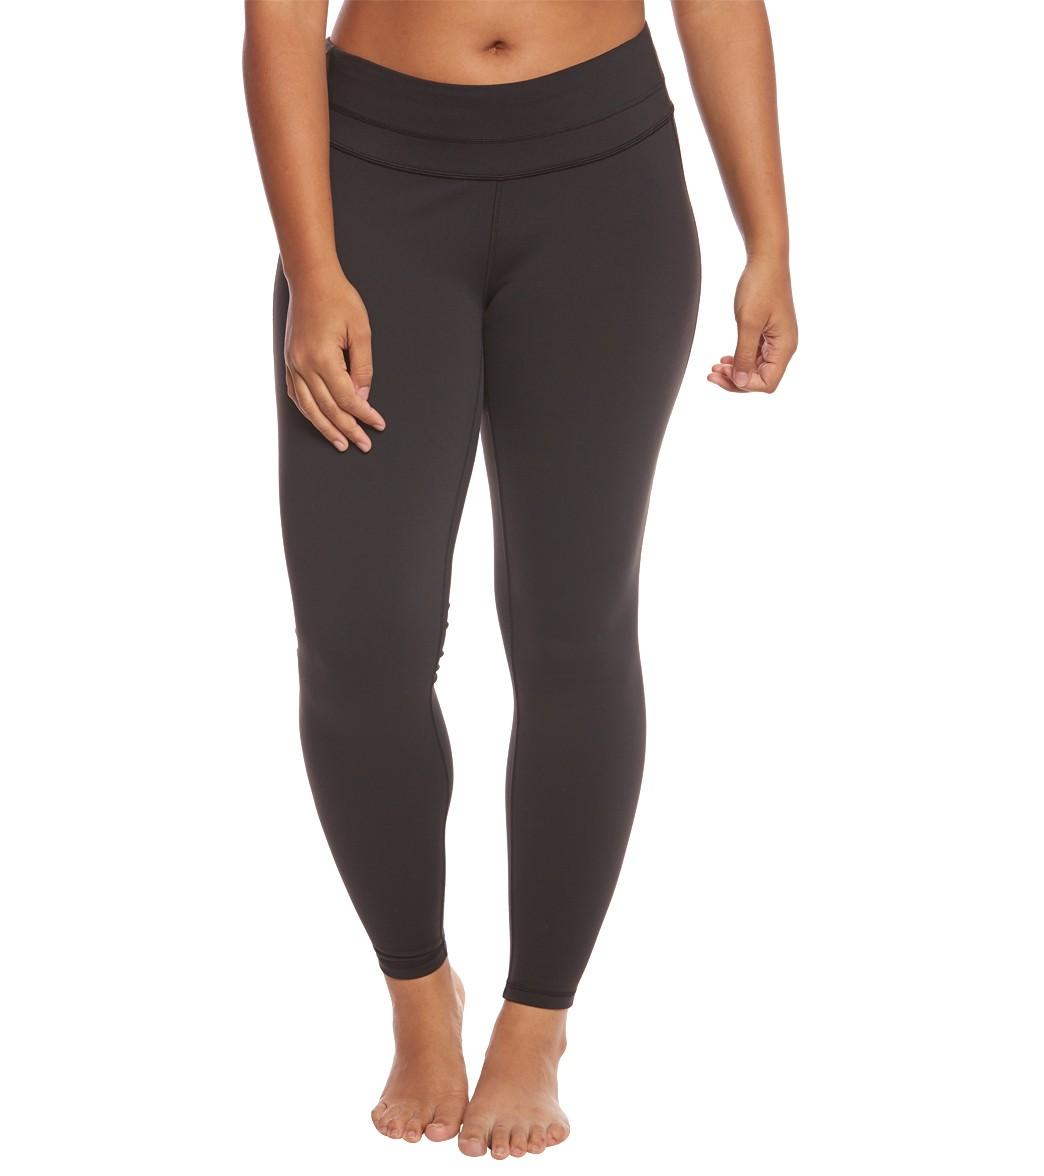 0bfe4c119bdbf Lucy Women's Plus Size Studio Hatha Legging at SwimOutlet.com ...